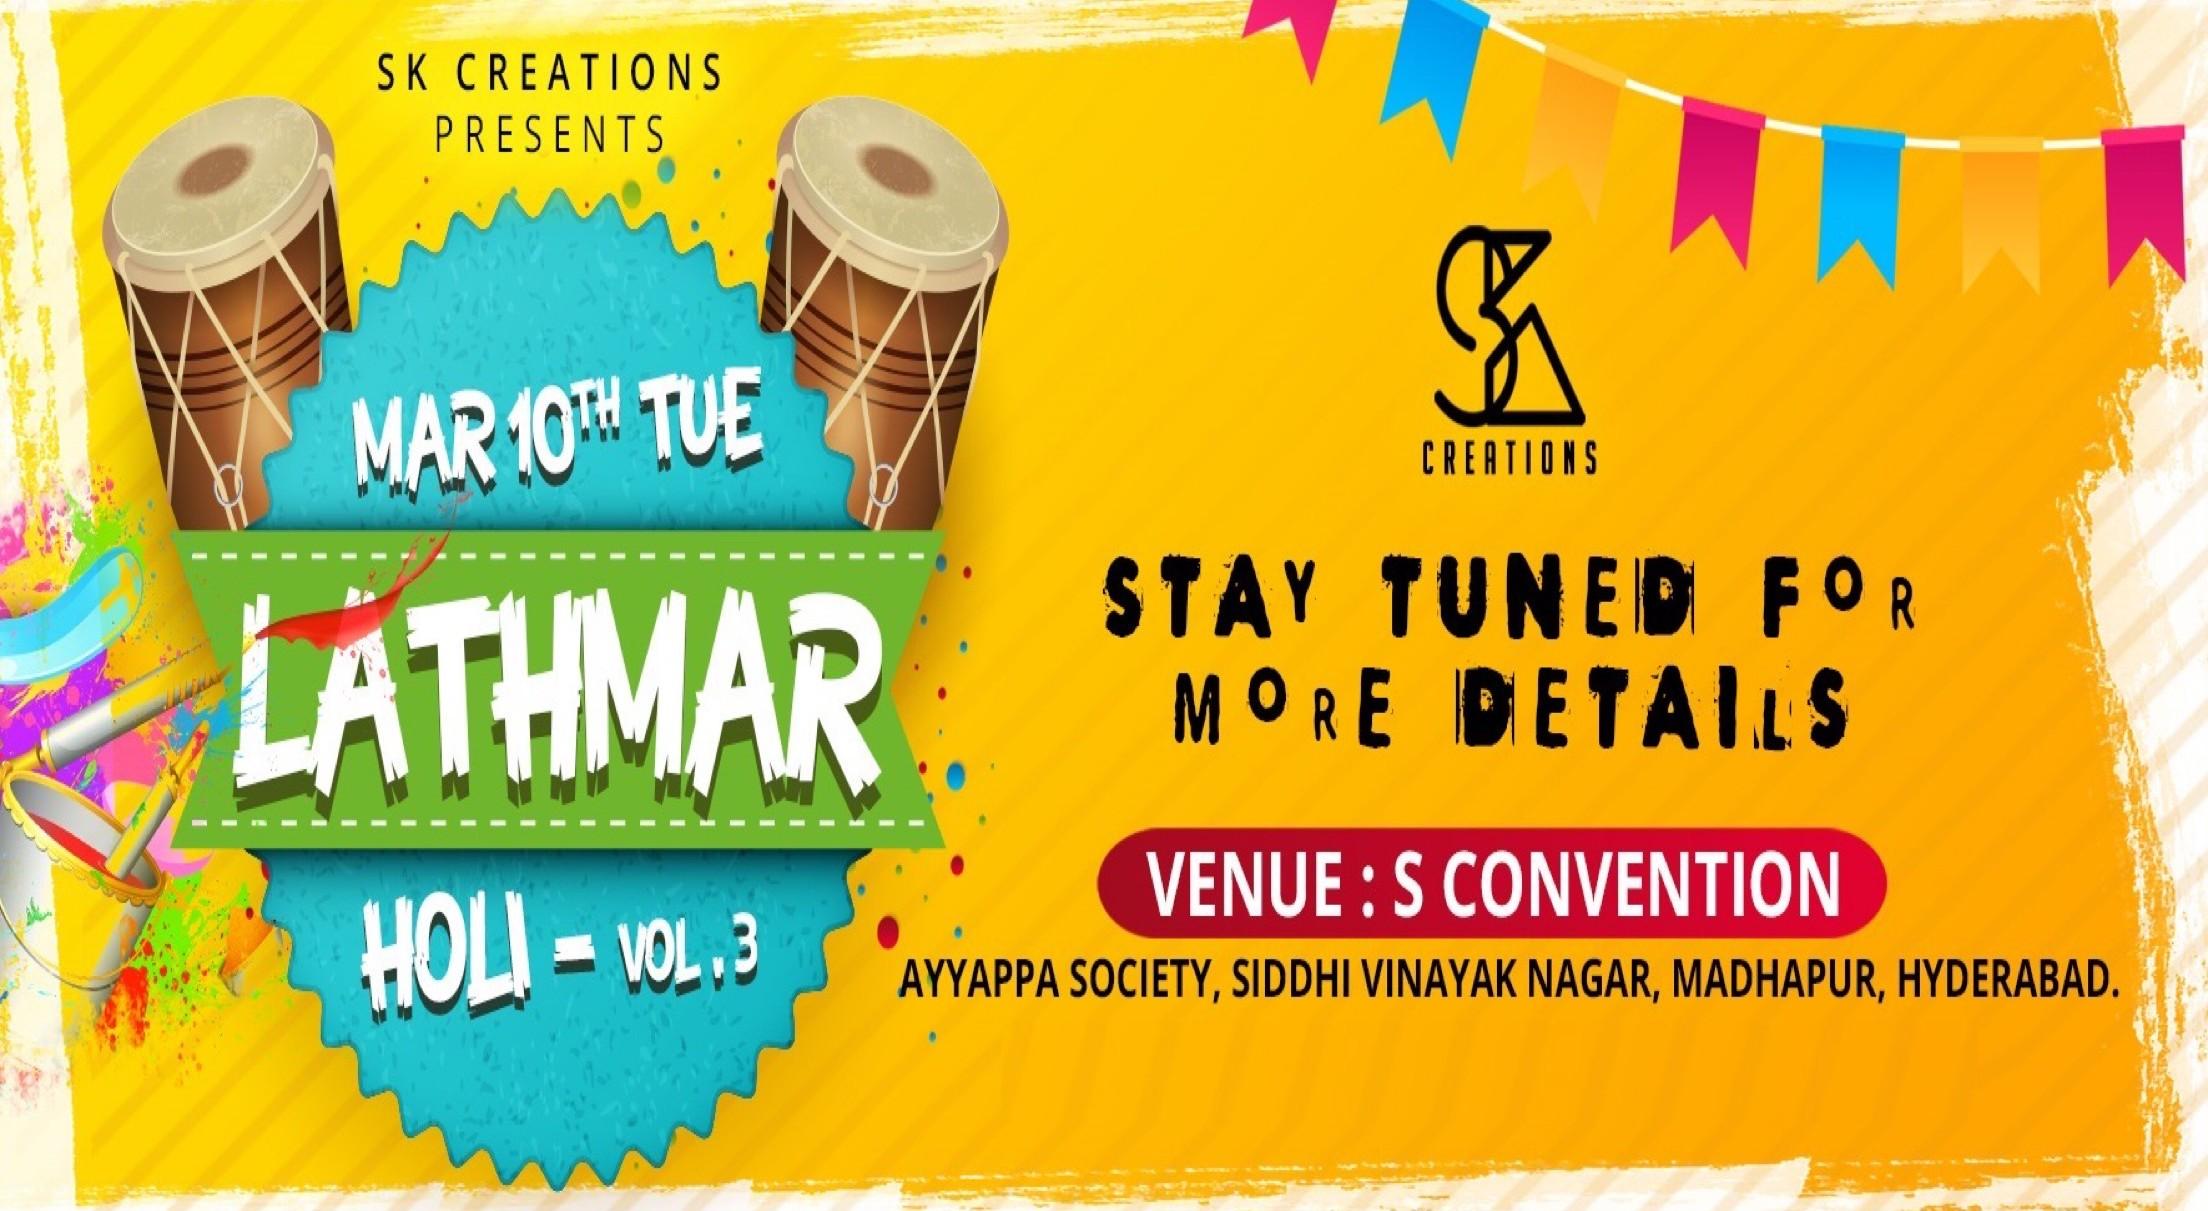 LATHMAR HOLI VOL.3 (Hyderabads biggest holi event)